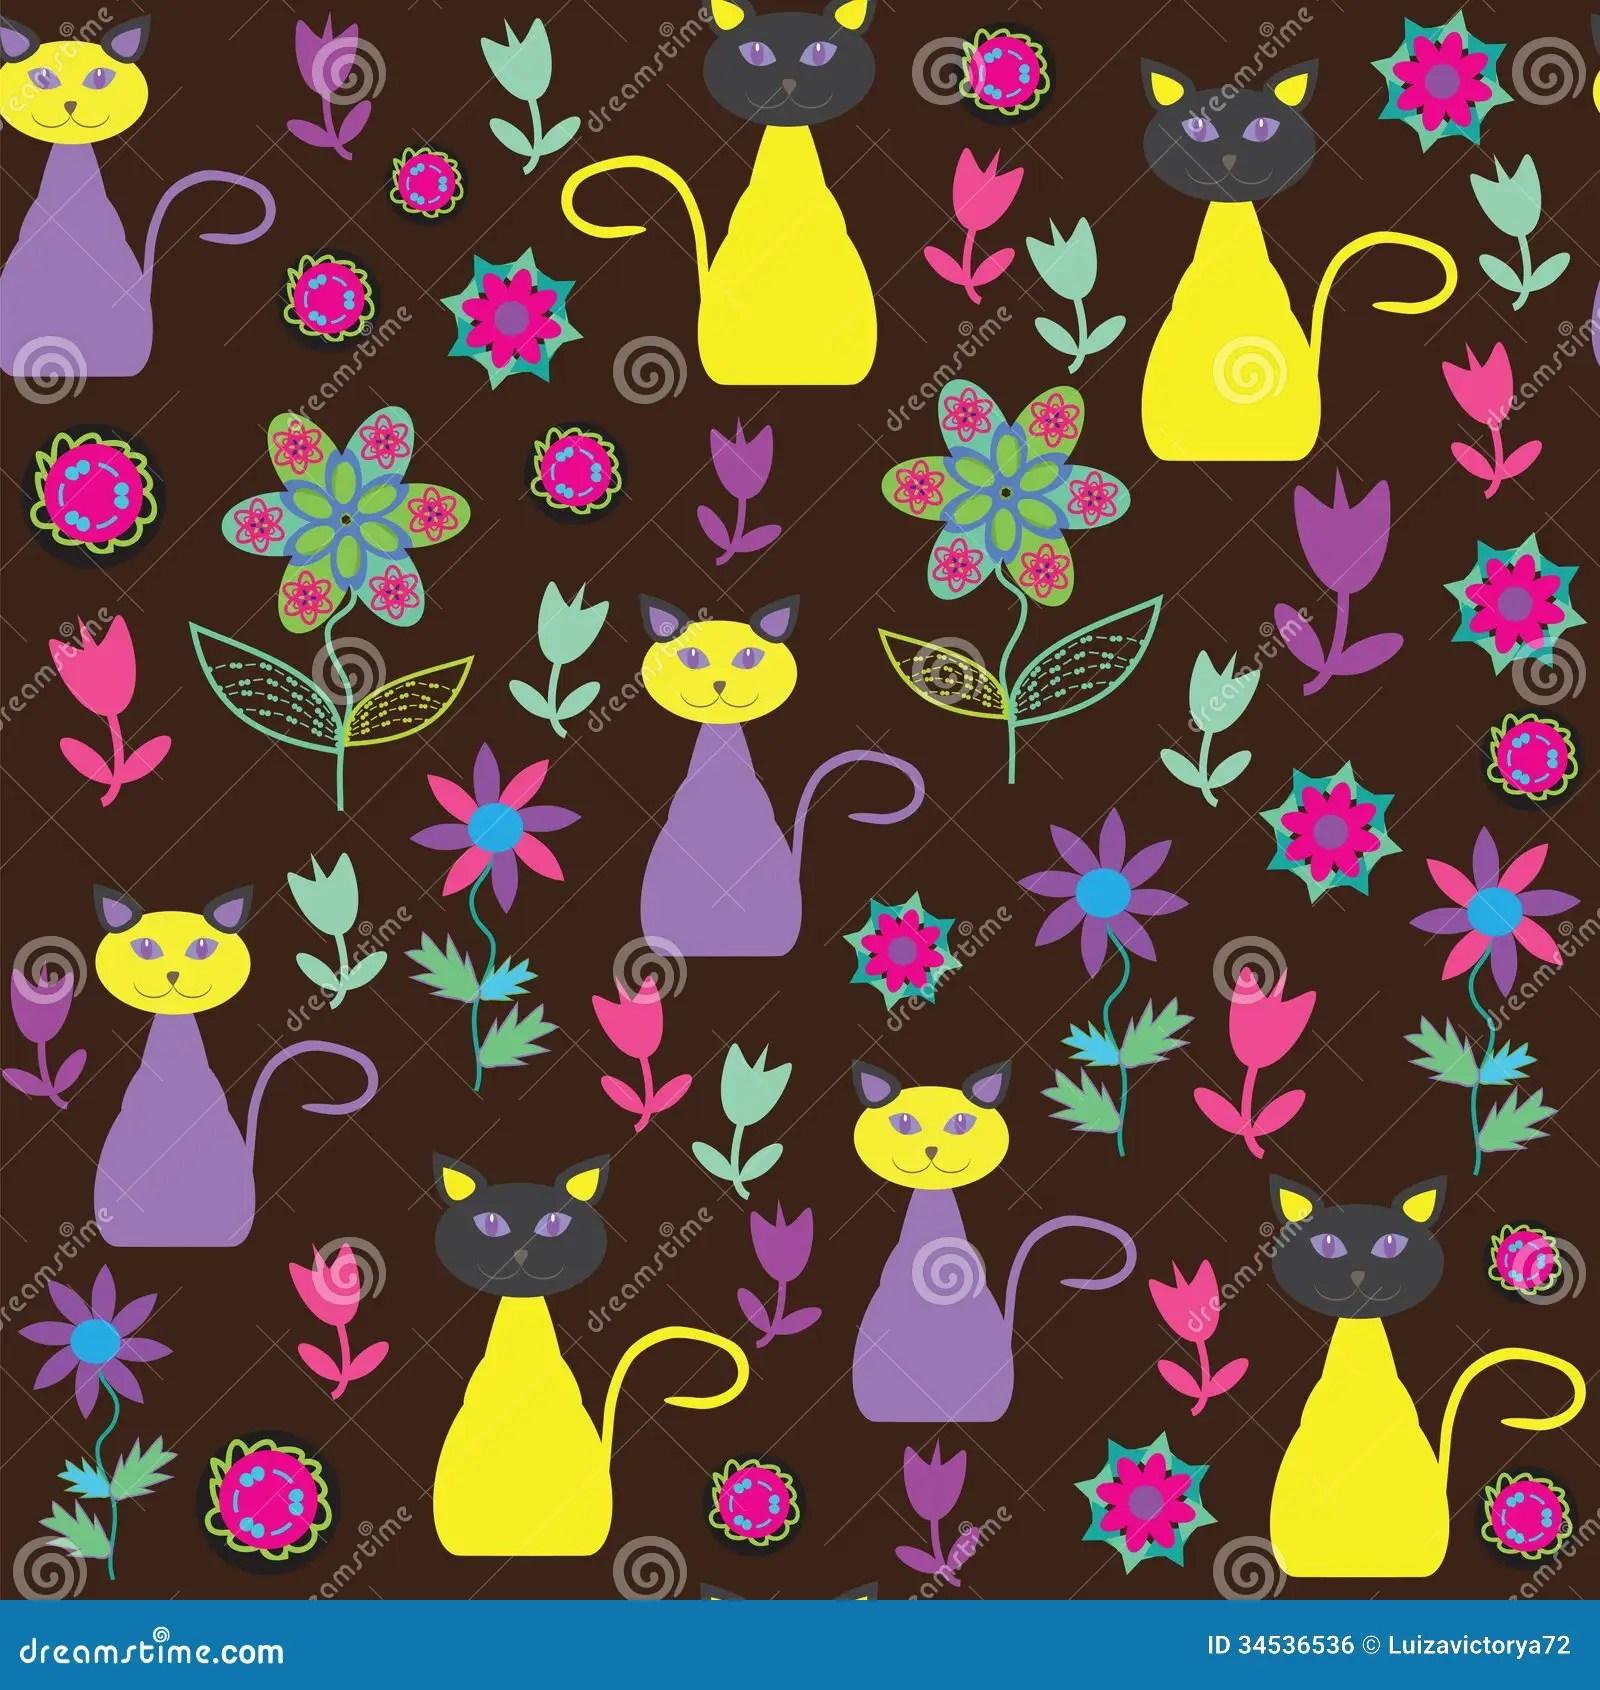 Cute Minnie Mouse Wallpaper Cute Cats Seamless Pattern Seamless Pattern Can B Stock